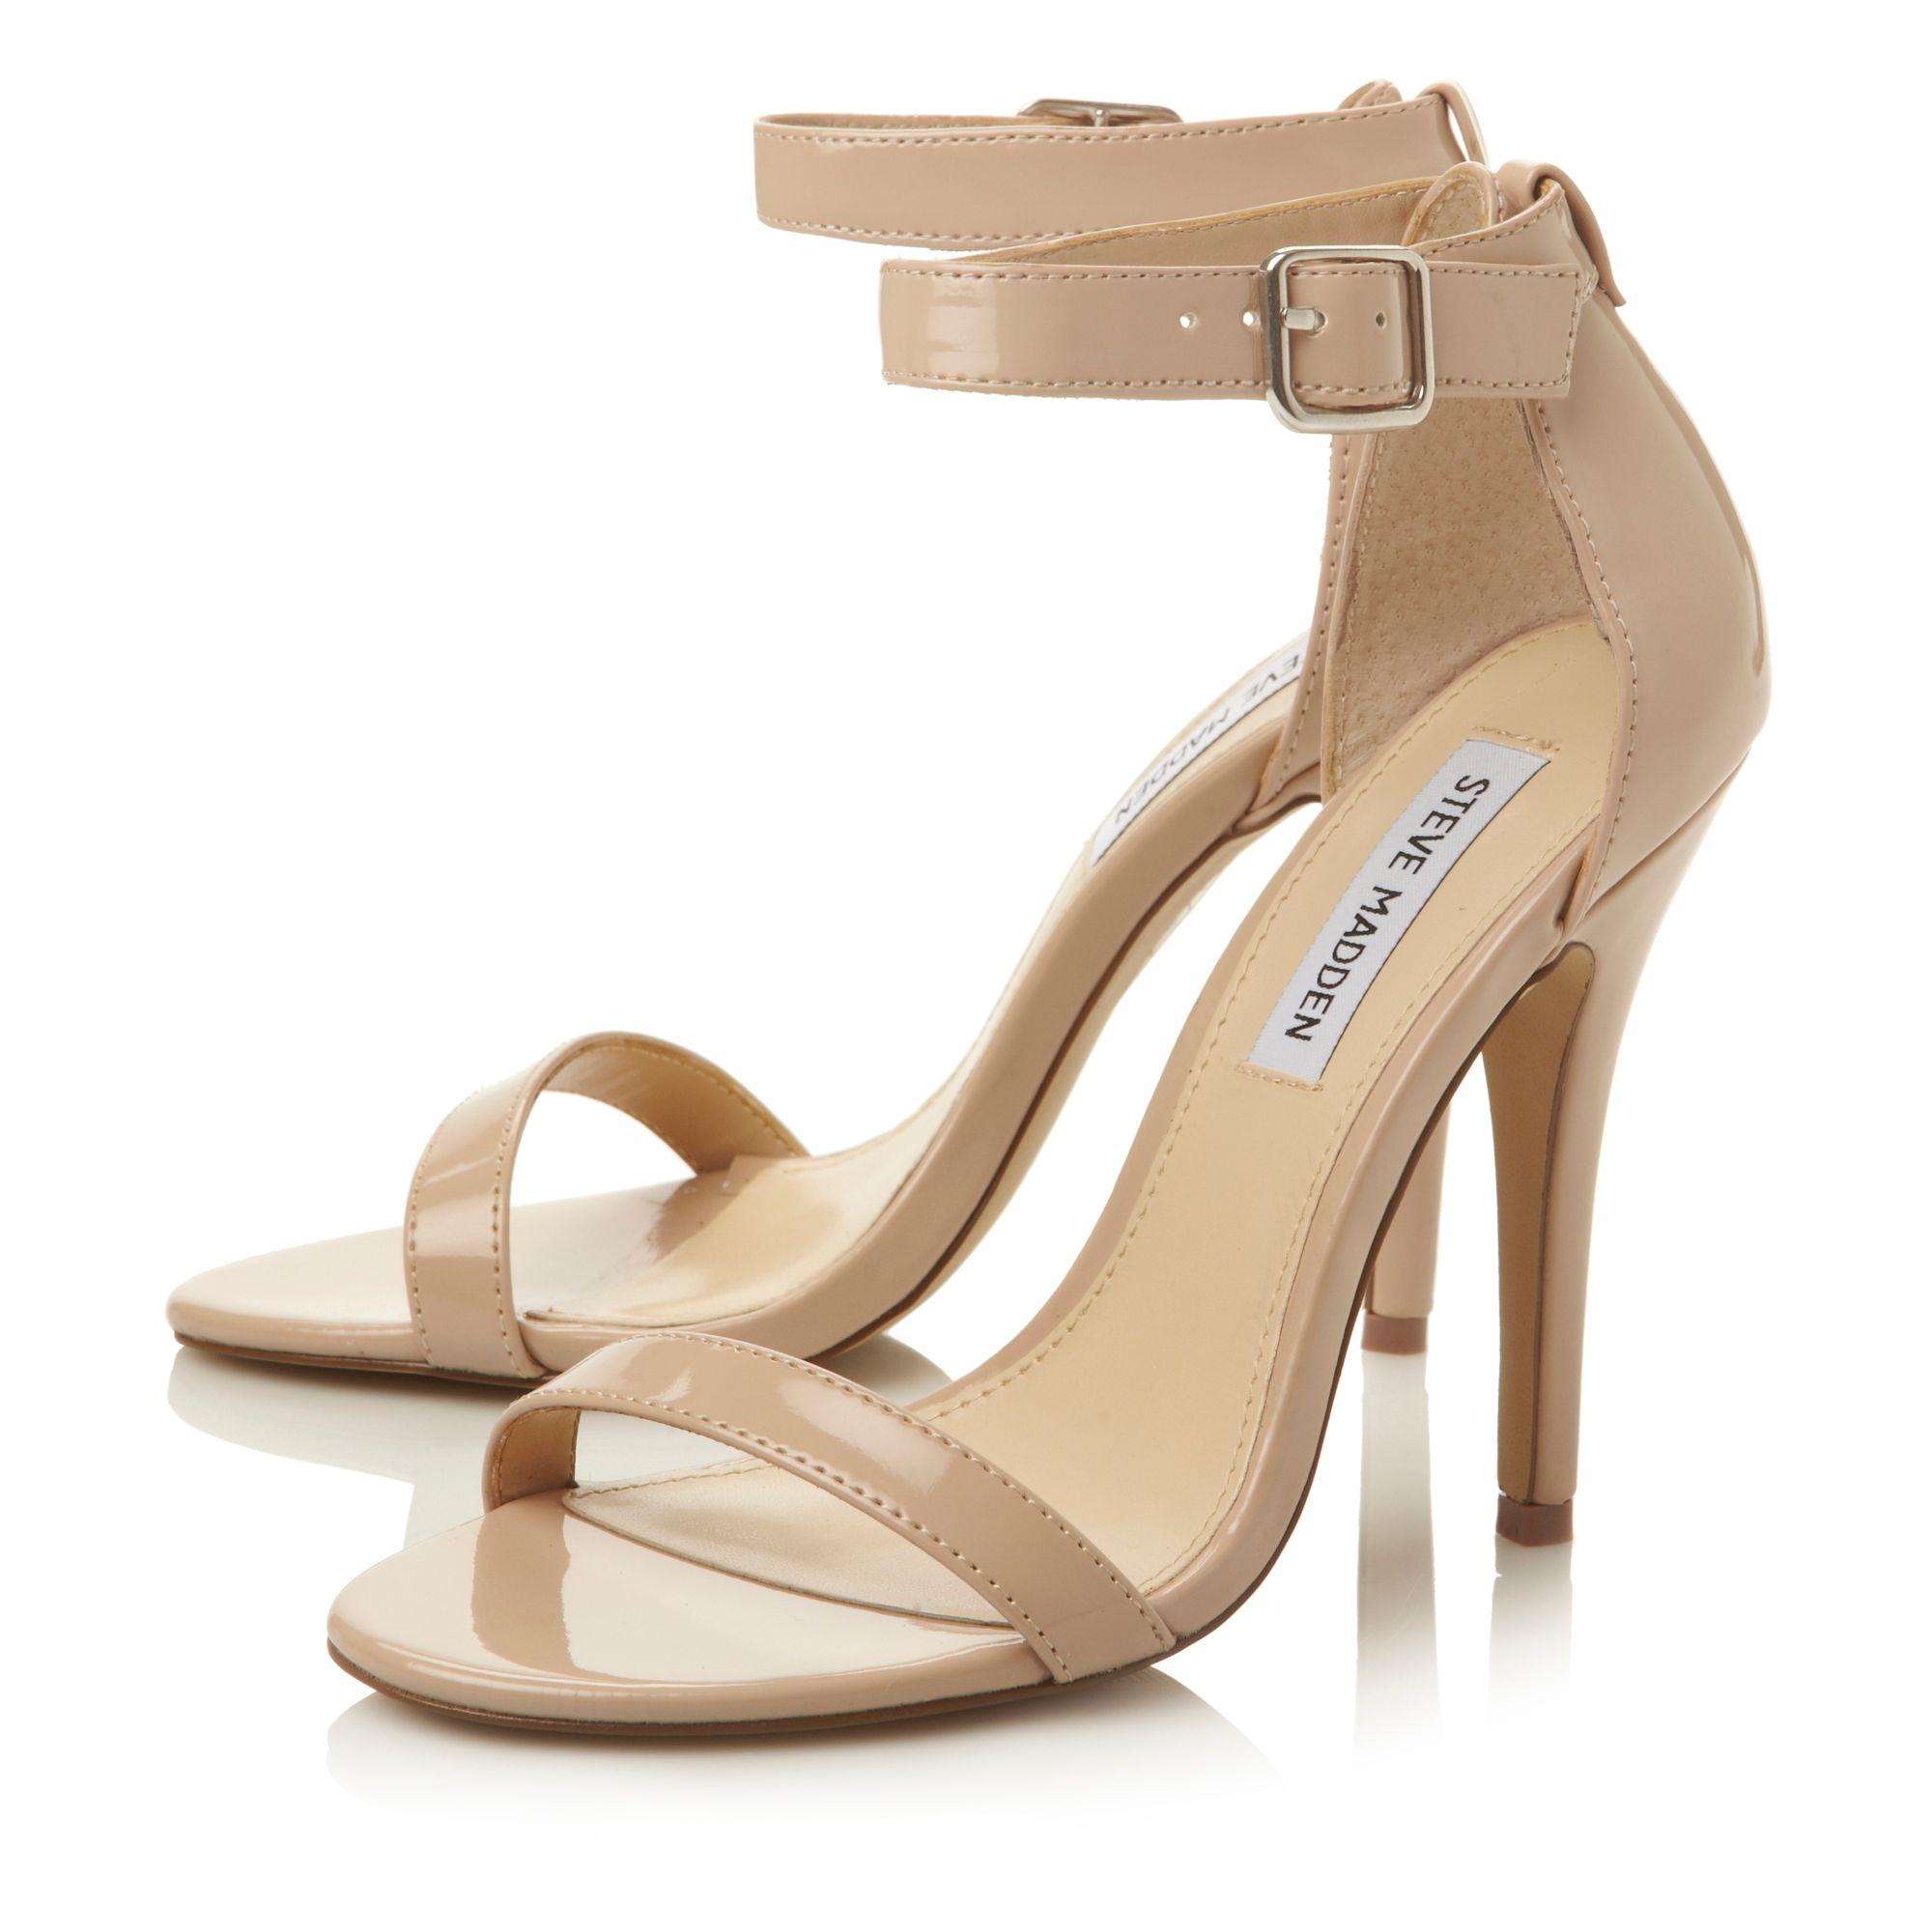 Topshop Shoes Heels